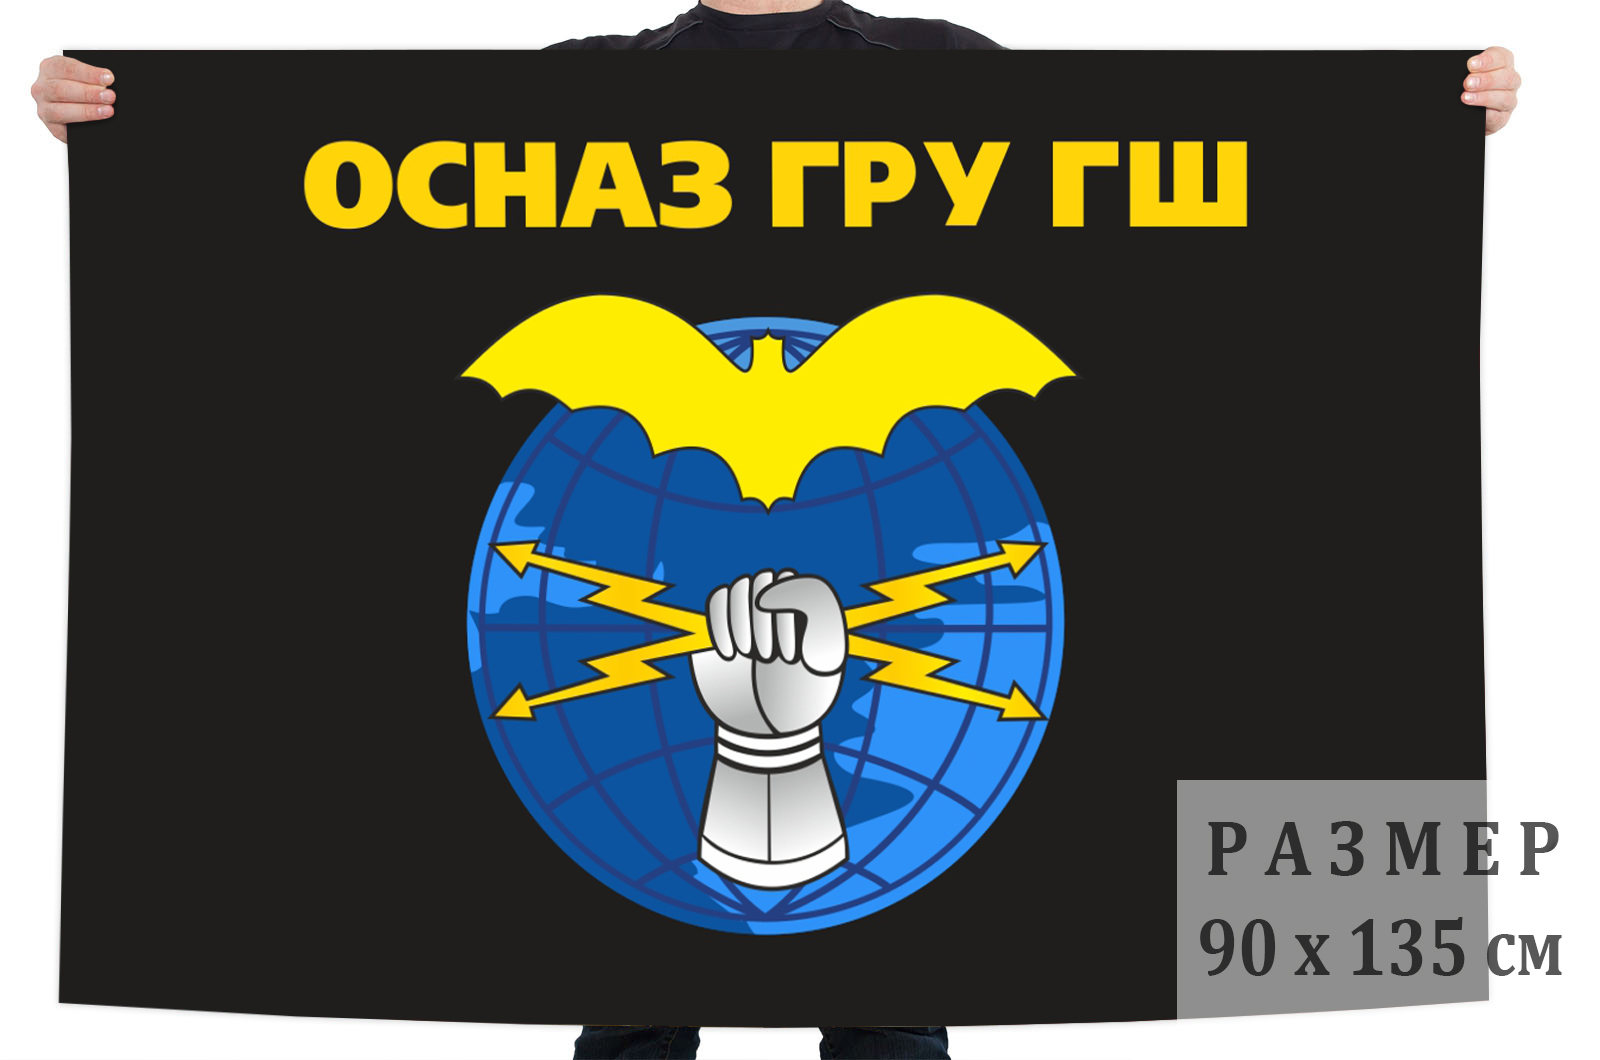 Флаг ОСНАЗ ГРУ ГШ Радиоразведка